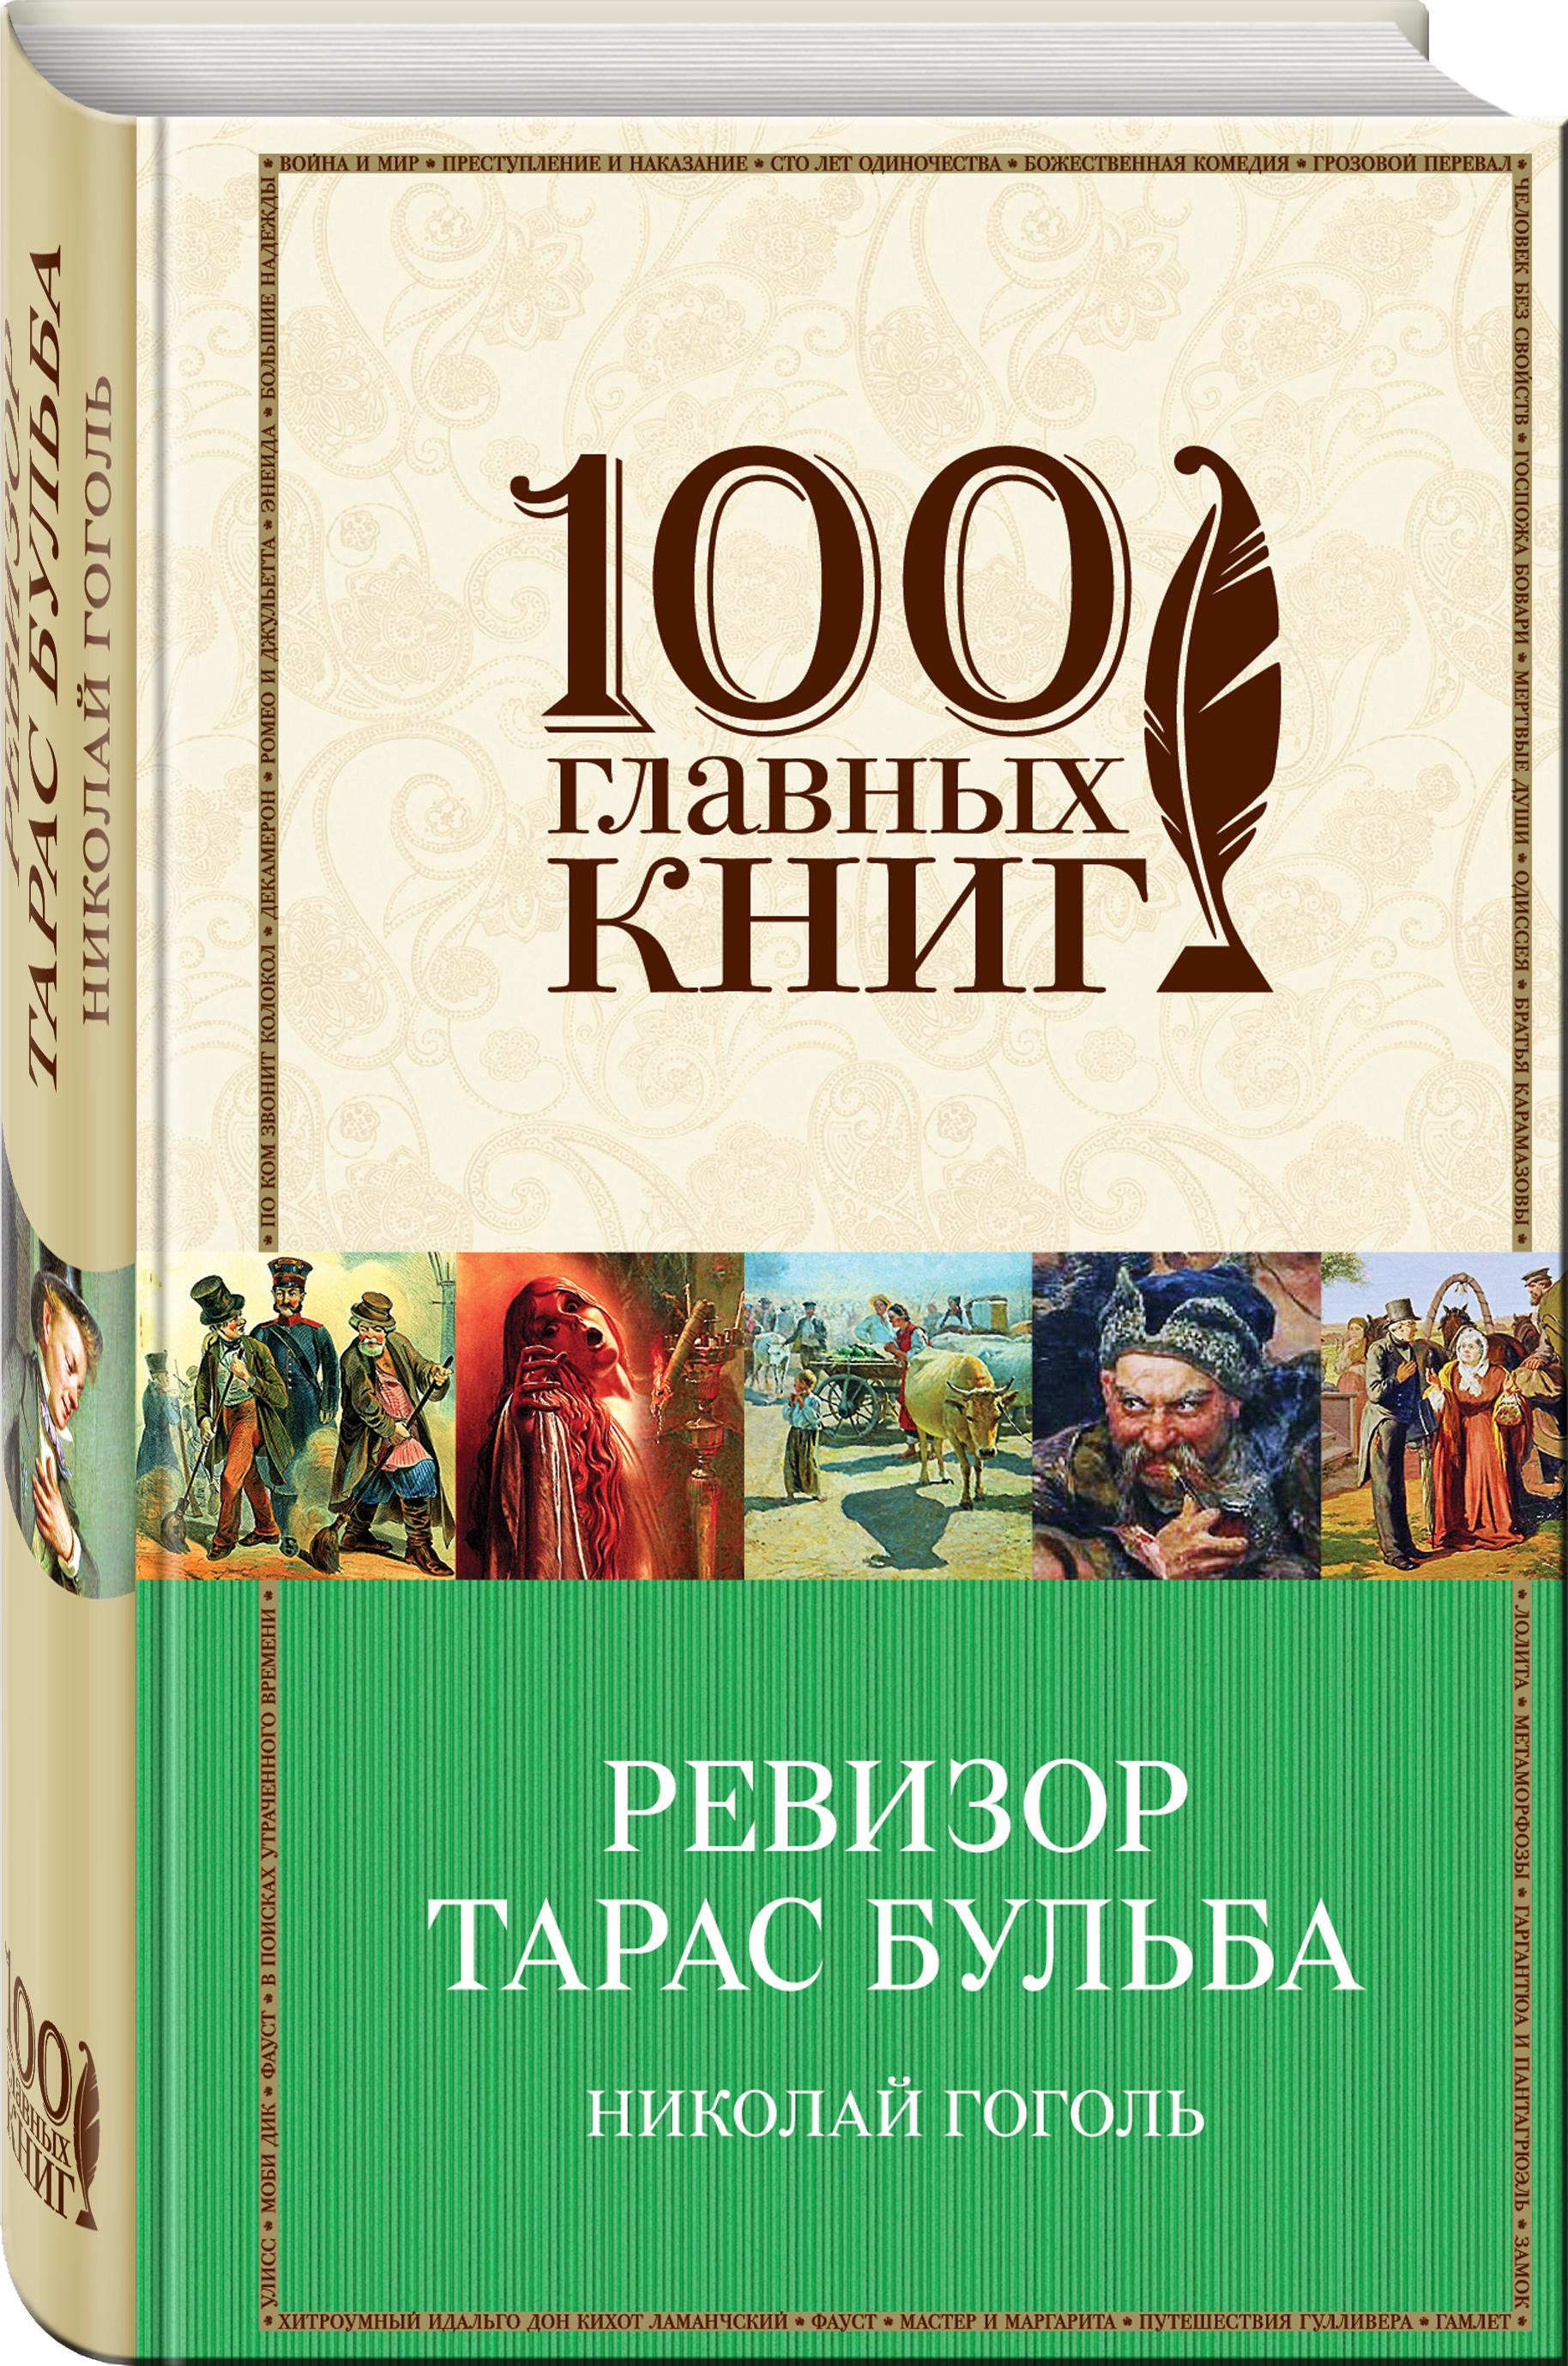 Николай Гоголь Ревизор. Тарас Бульба